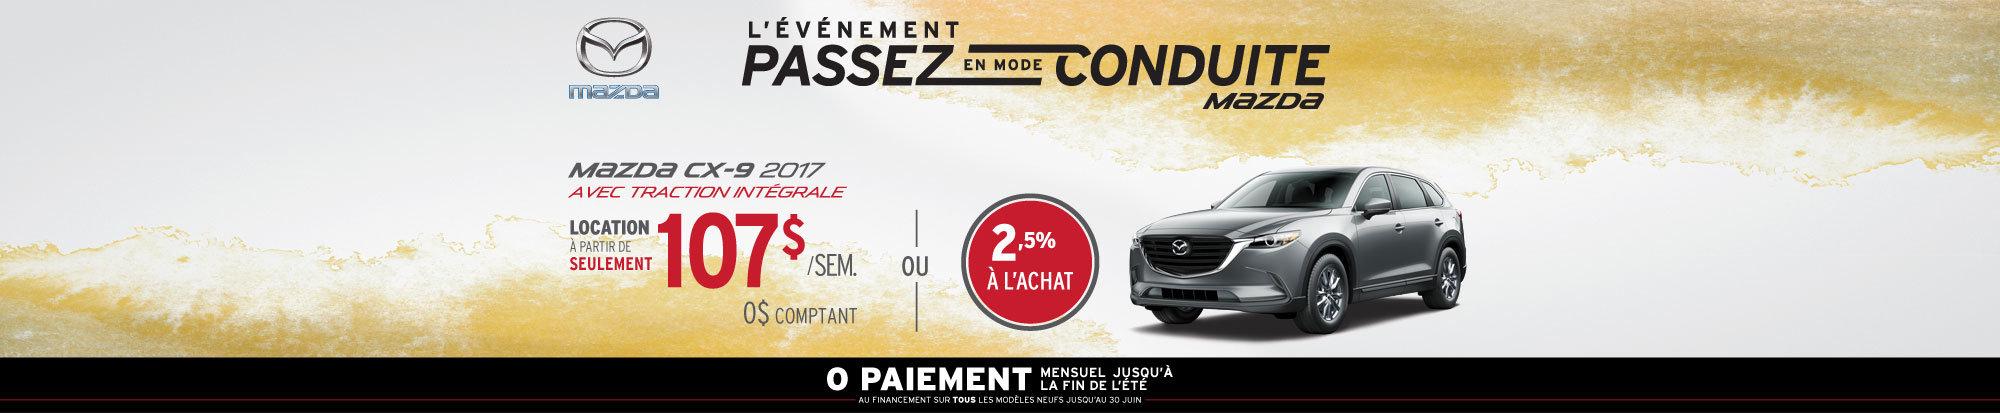 Louez la Mazda CX-9 (web)